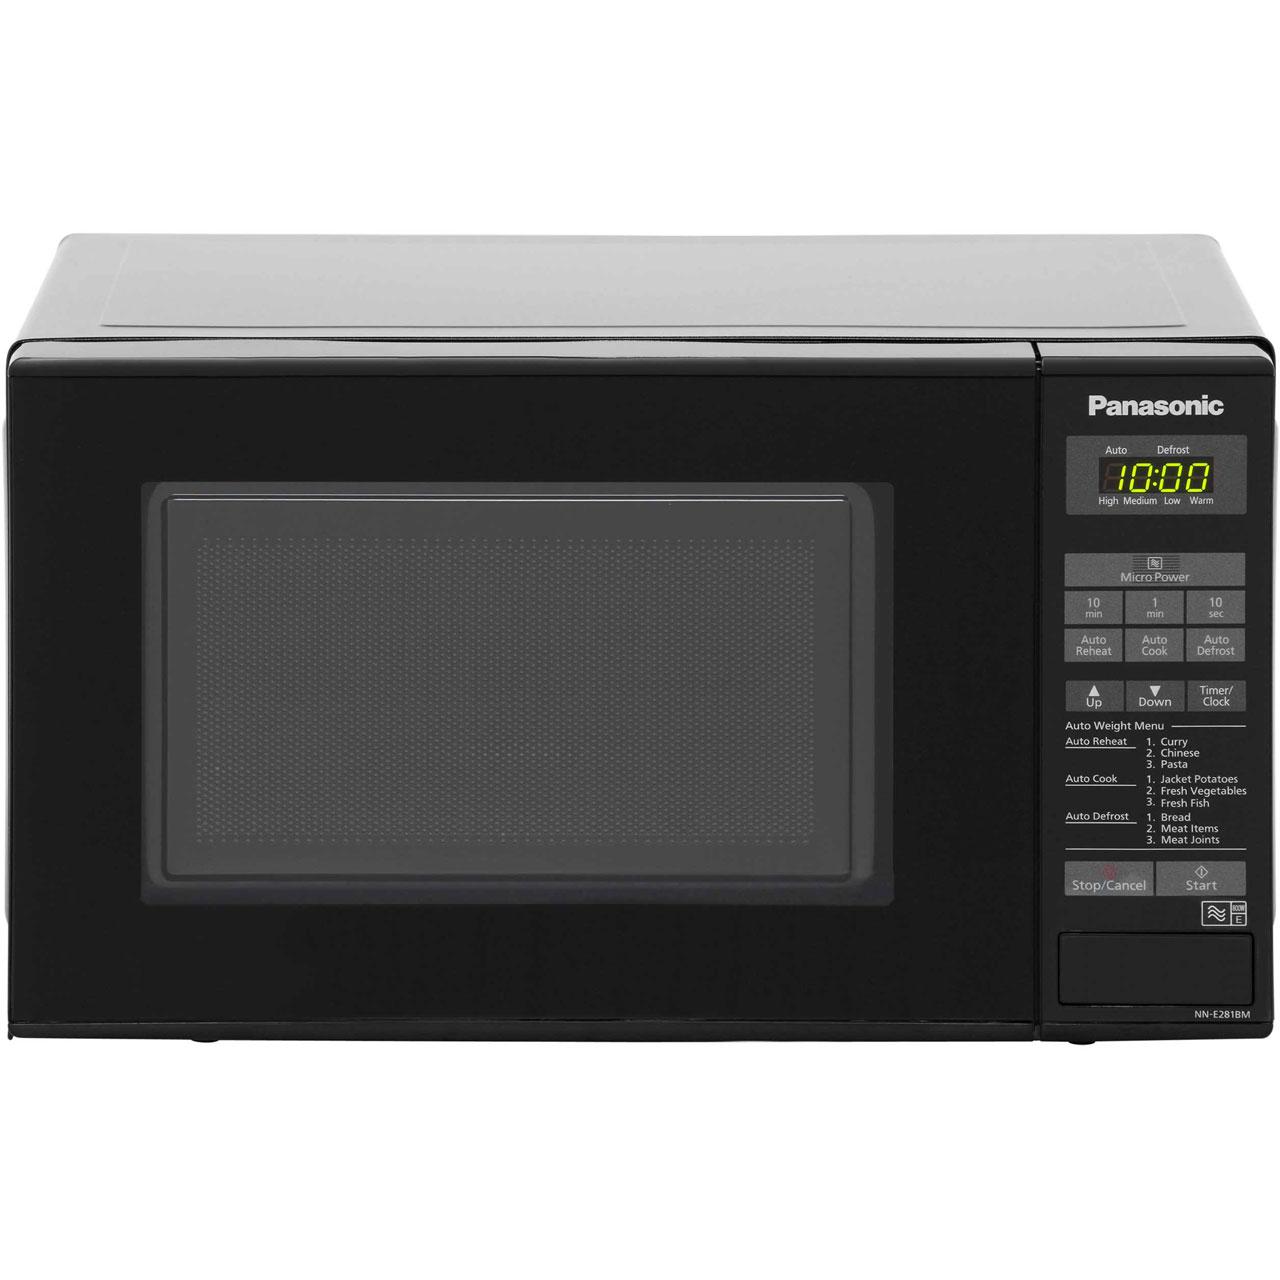 Panasonic Compact Nn E281bmbpq 20 Litre Microwave Black